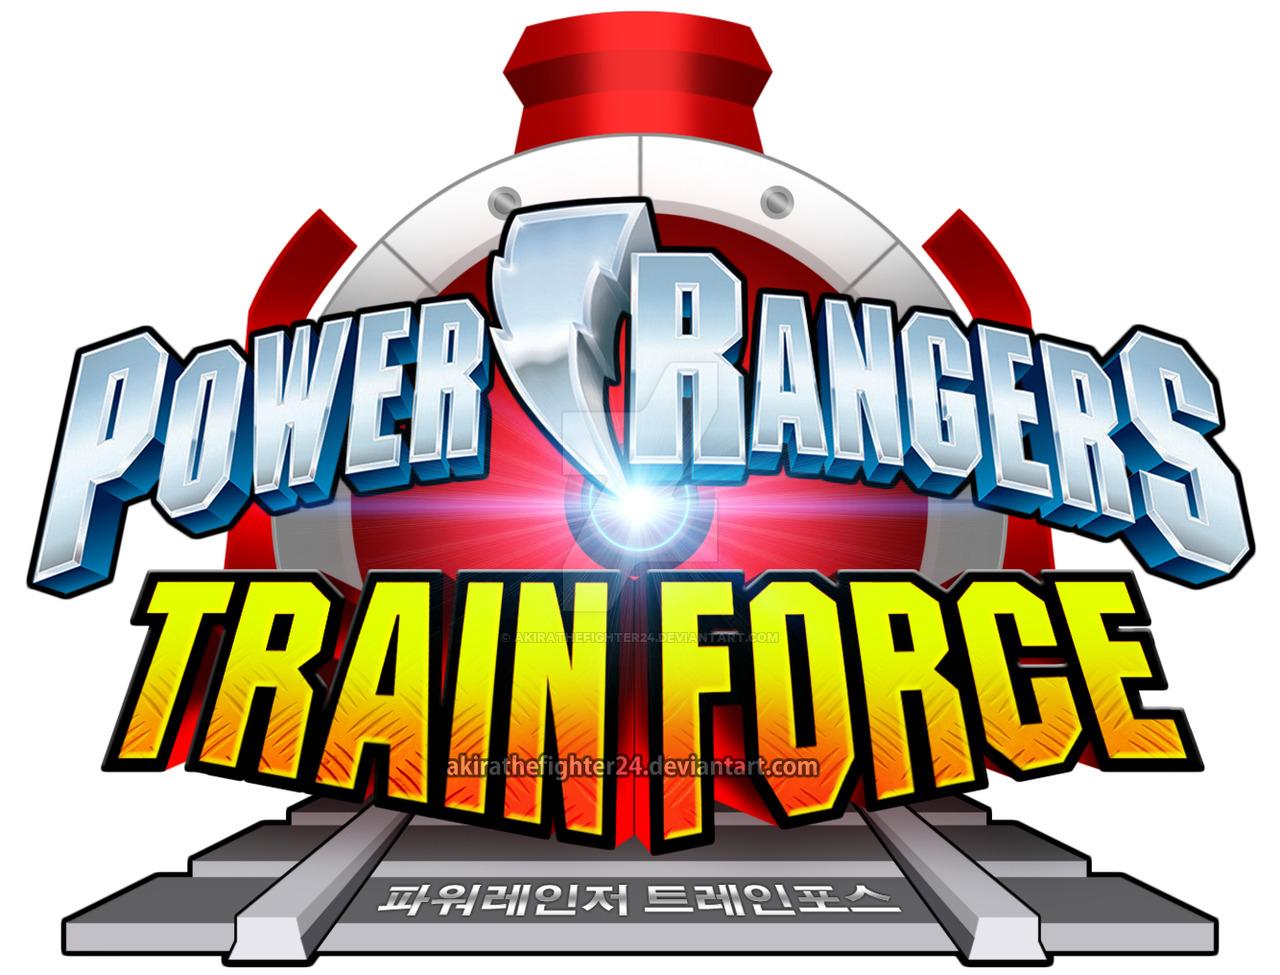 1280x975 Power Rangers Train Force English Logo (Fanmade) By